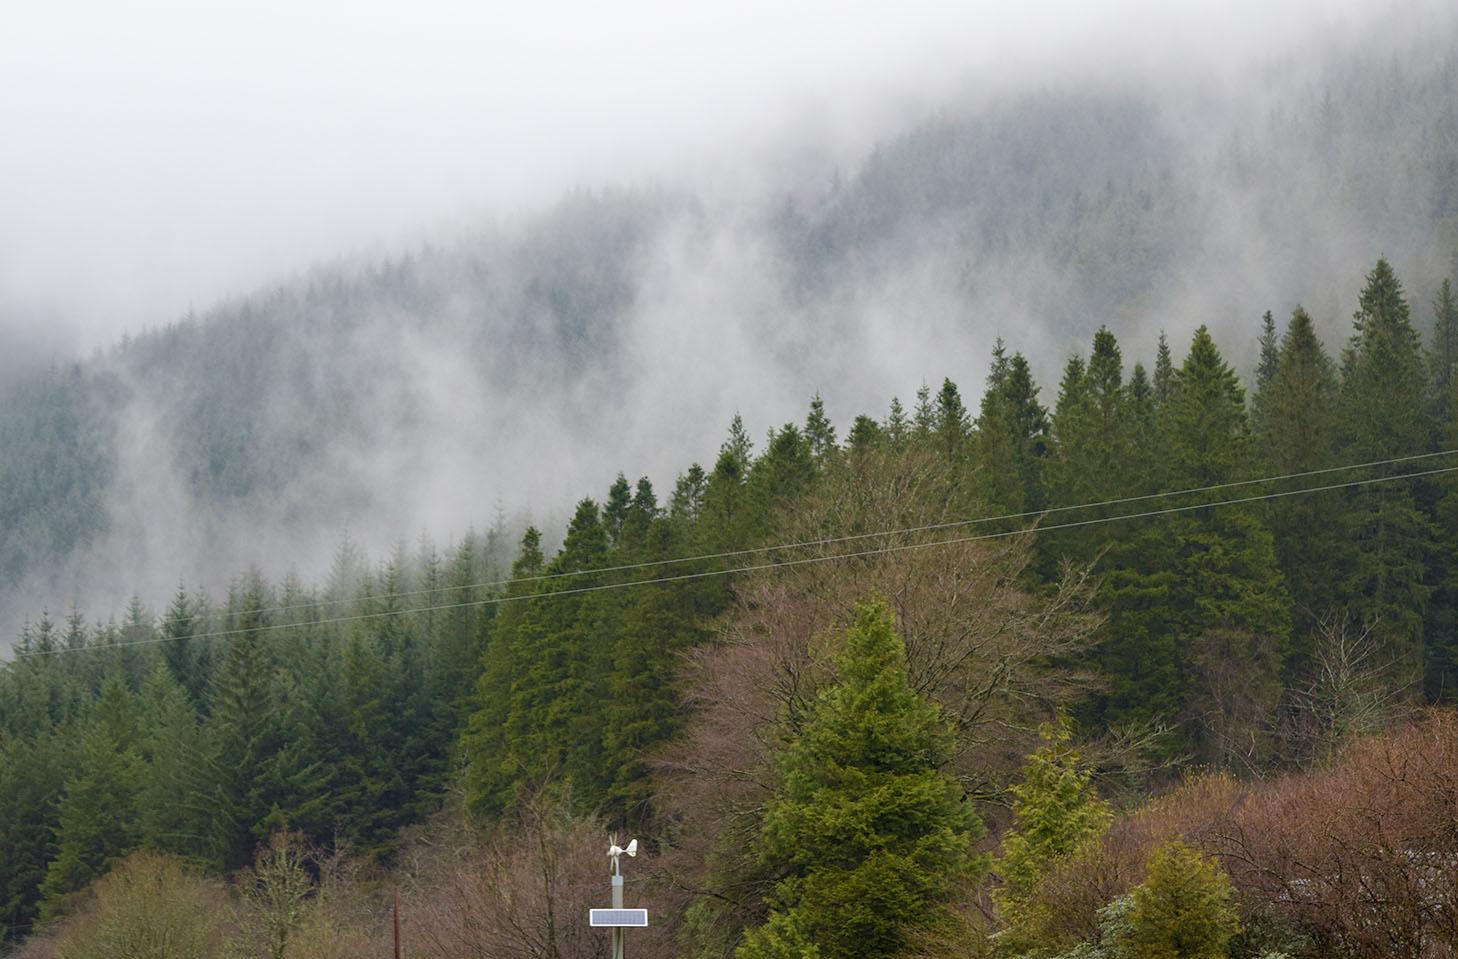 Mist on Ben Arthur Photograph by David Hill taken 4 April 2016, 14.54 GMT